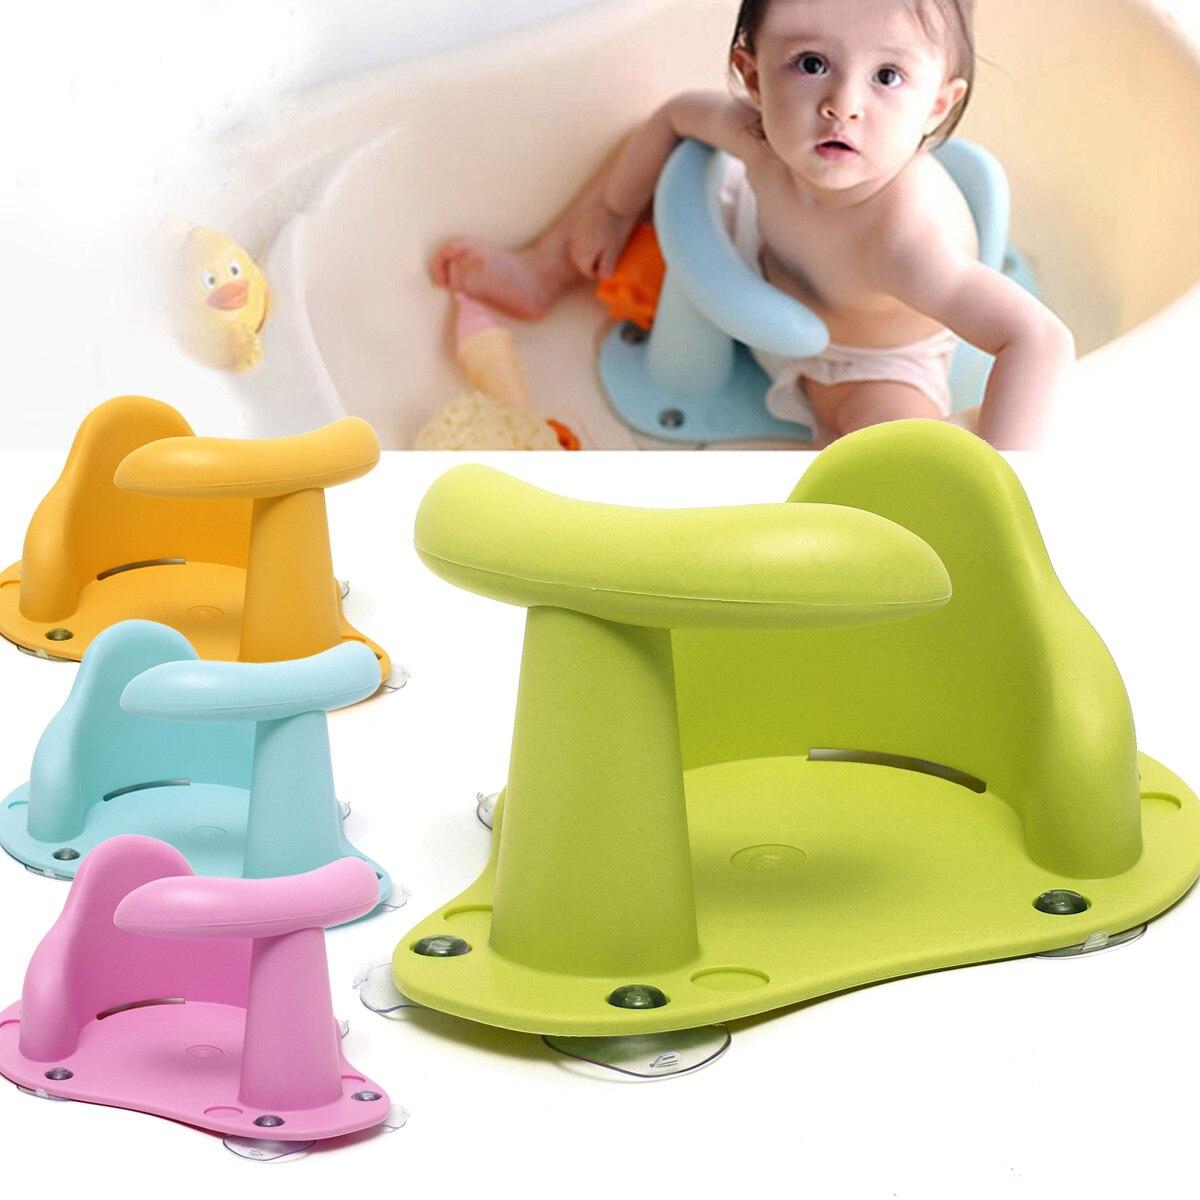 Tub Seat Baby Bathtub Pad Mat Chair Safety Security Anti Slip Baby Care Children Bathing Seat Washing Toys 37.5x 30.5x 15cm